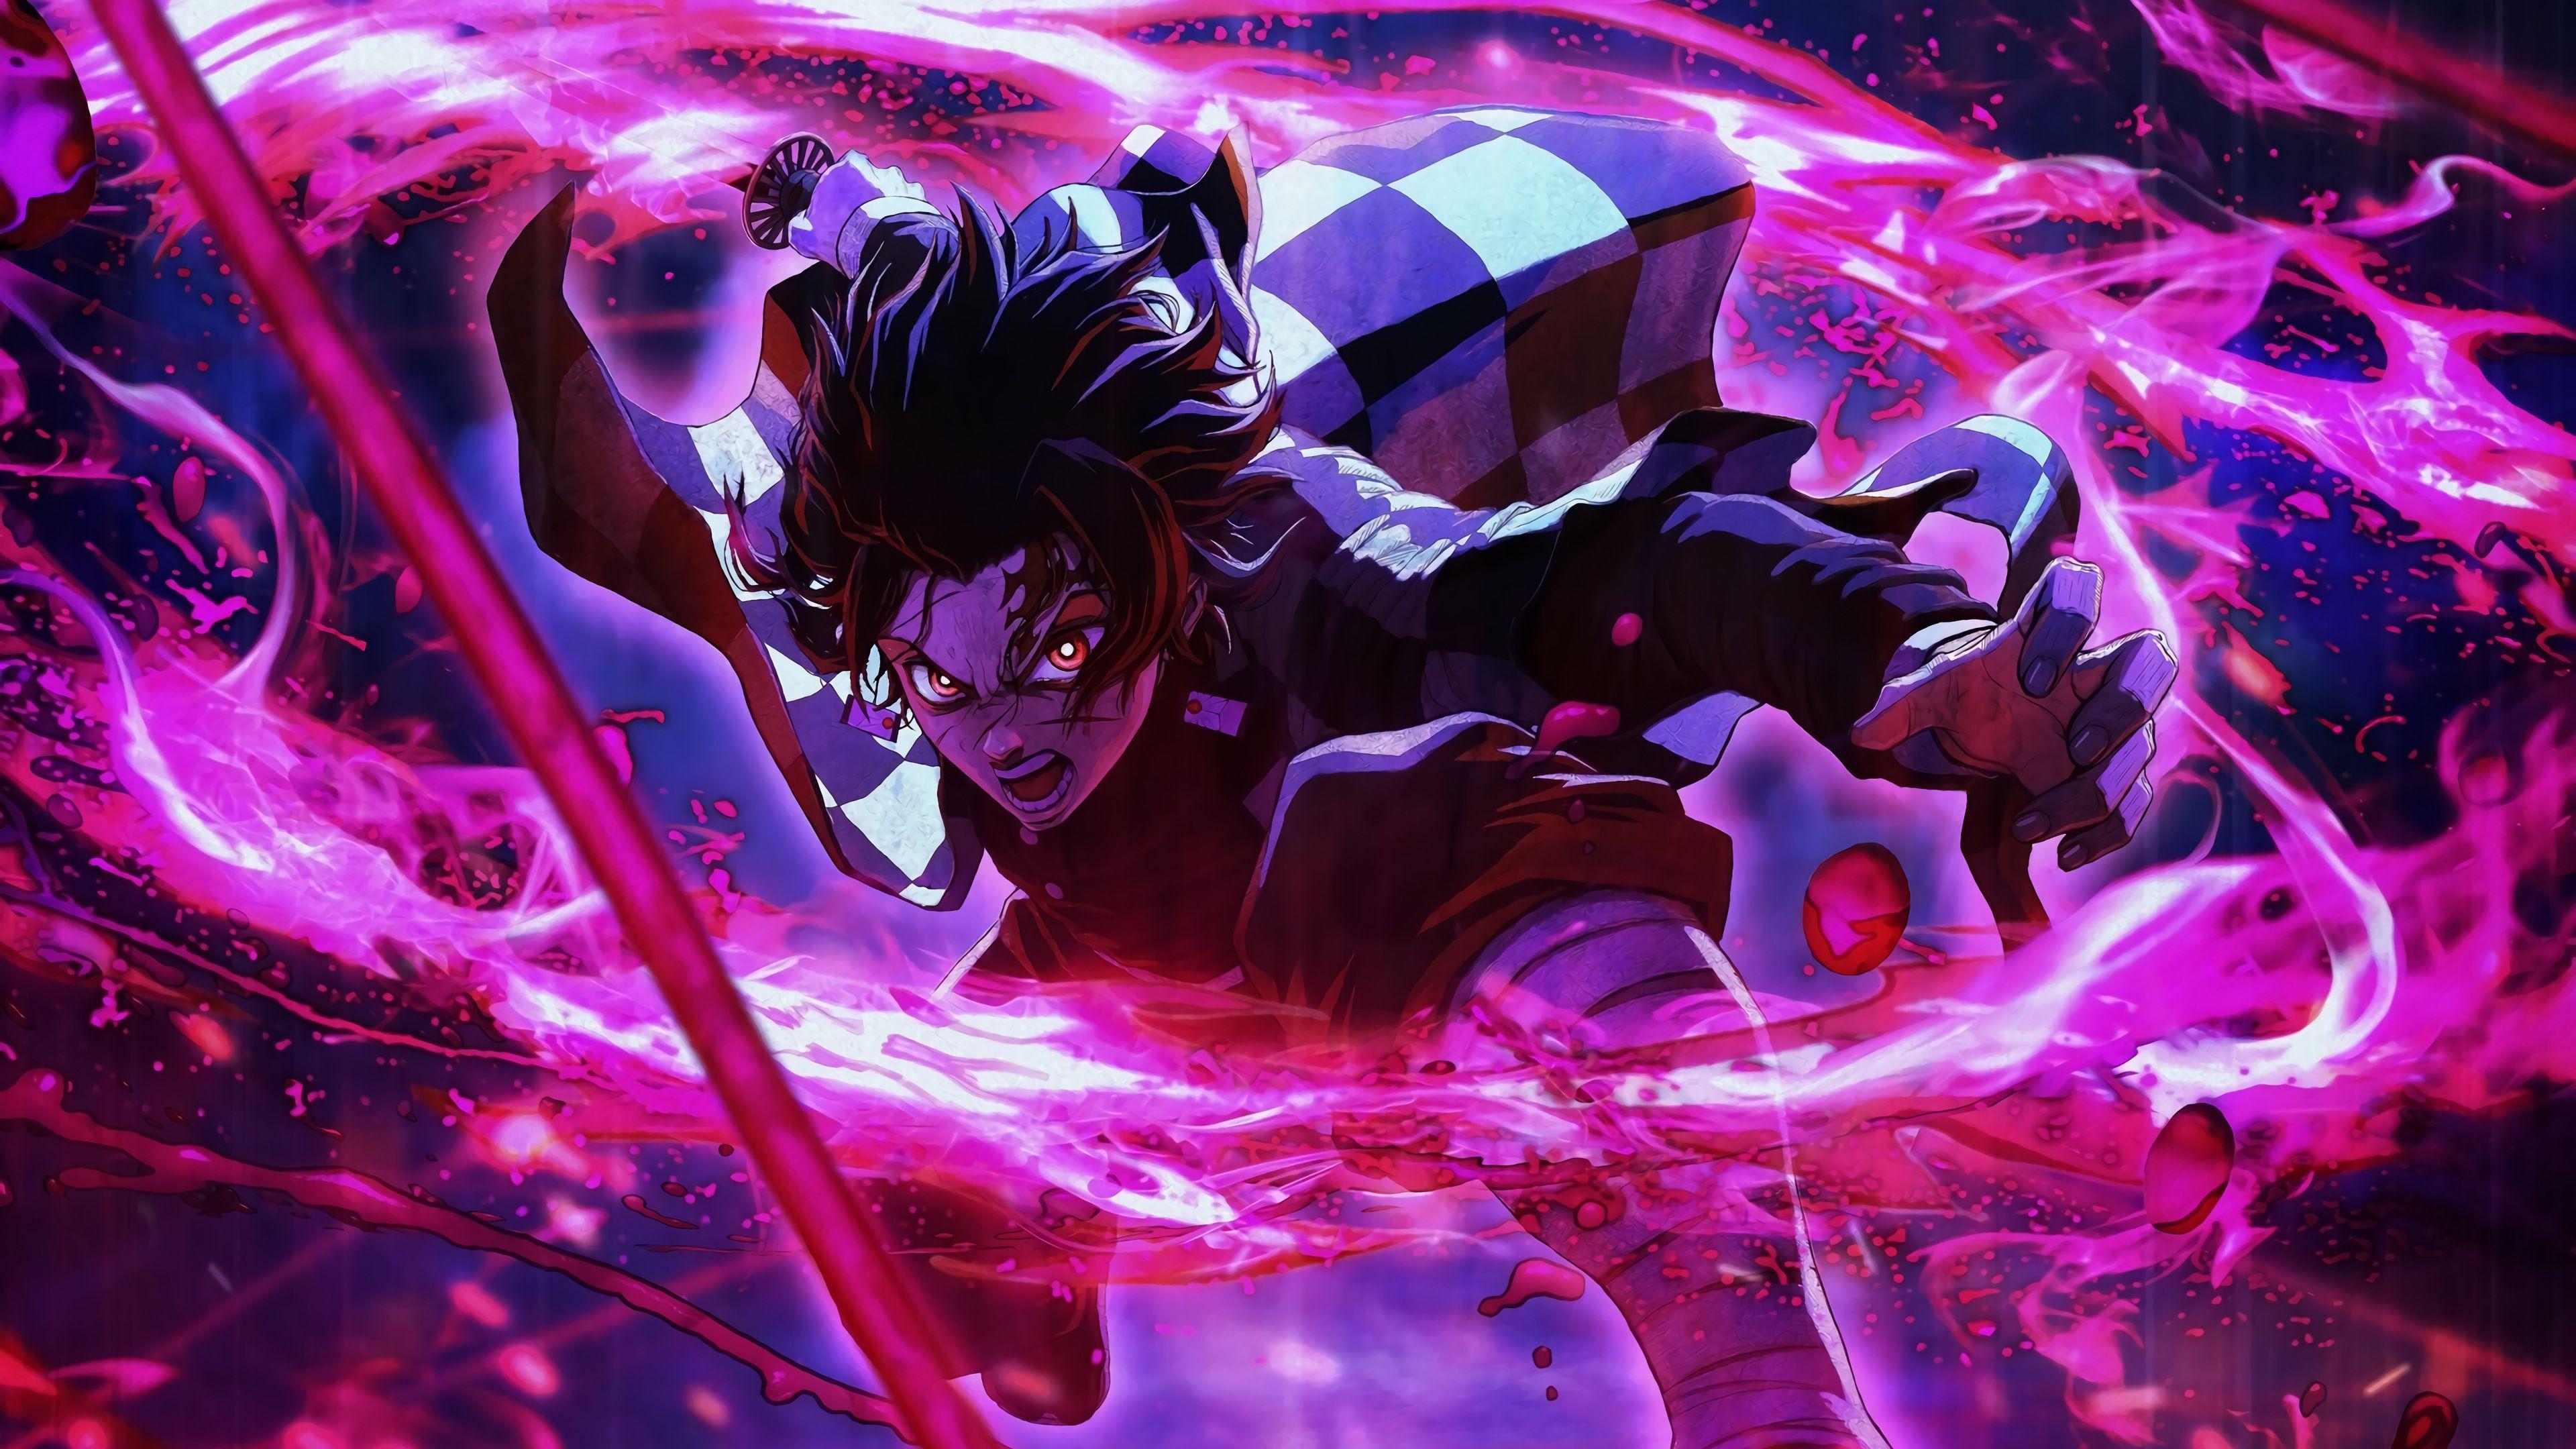 Tanjiro The DemonSlayer Anime wallpaper Hd anime wallpapers 3840x2160